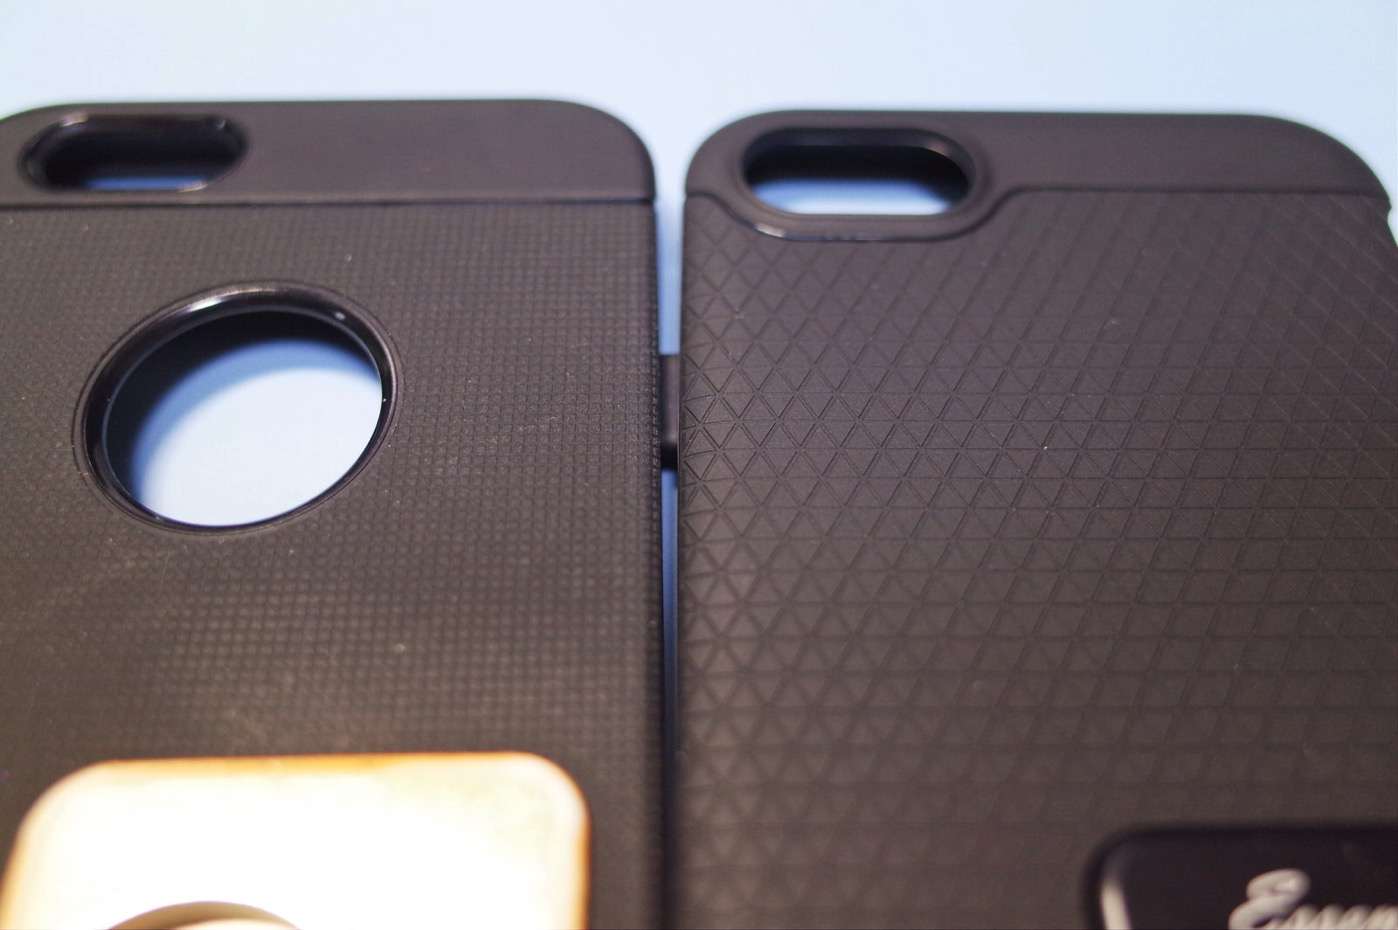 【Spigen】 iPhone7 ケース, ネオ・ハイブリッド [ 米軍MIL規格取得 二重構造 バンパー ] アイフォン 7 用 カバー (iPhone7, ガンメタル)-9